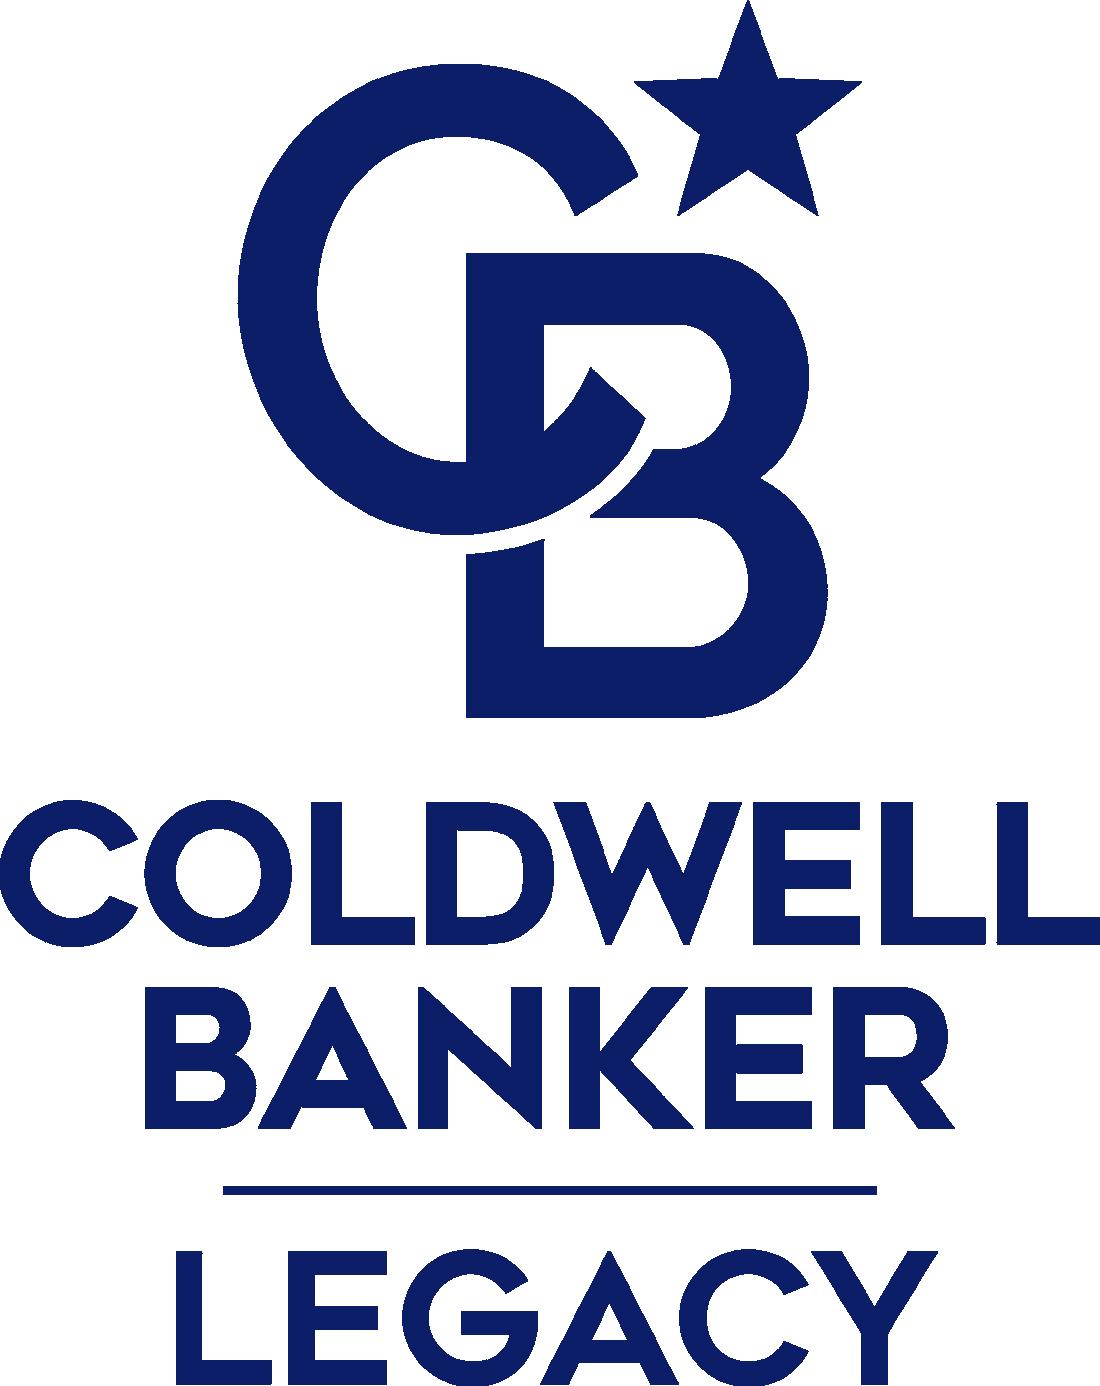 April Ewing - Coldwell Banker Legacy Realtors Logo